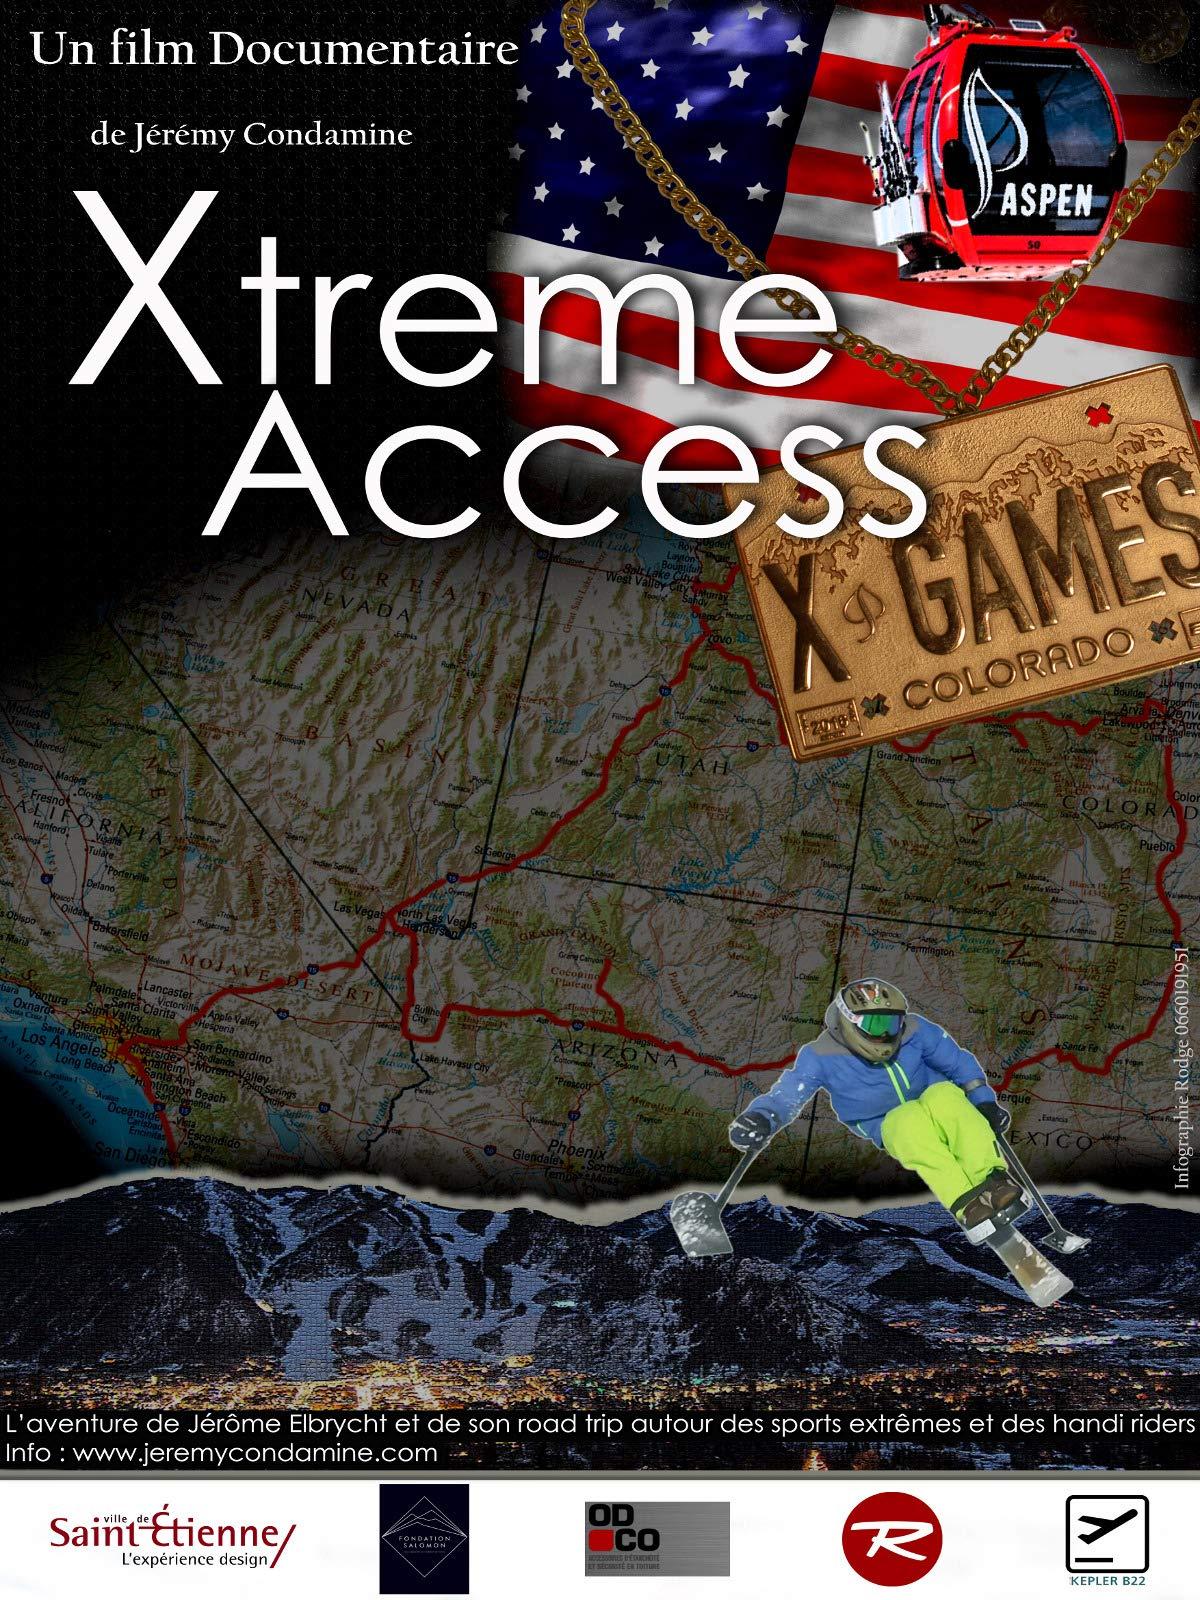 Xtreme Access